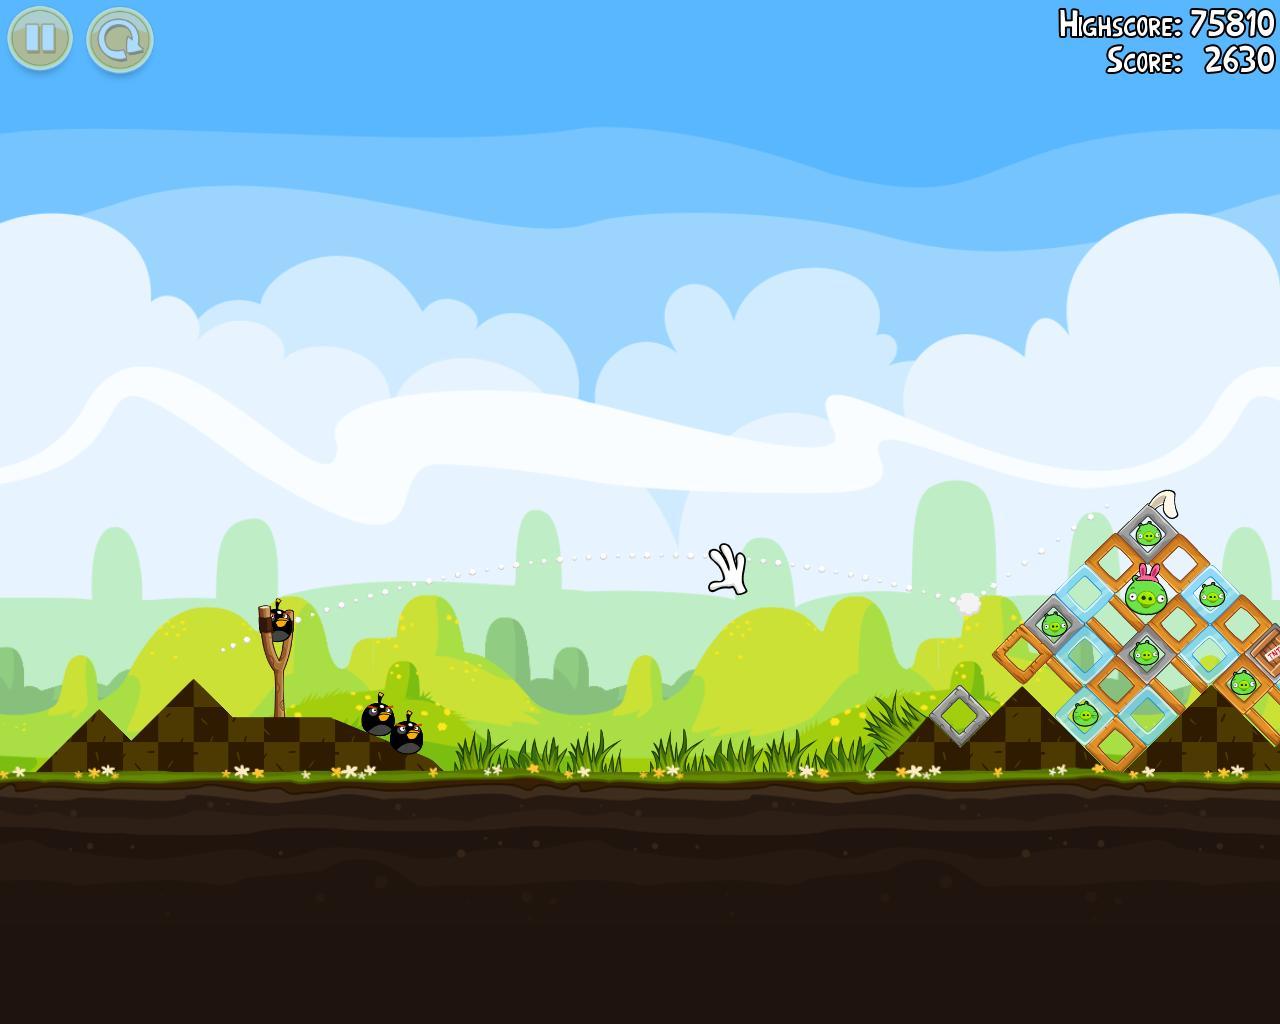 Angry Birds Seasons 1.5.1 PC+Crack 67bda91ef72f37b11c830486aef12523